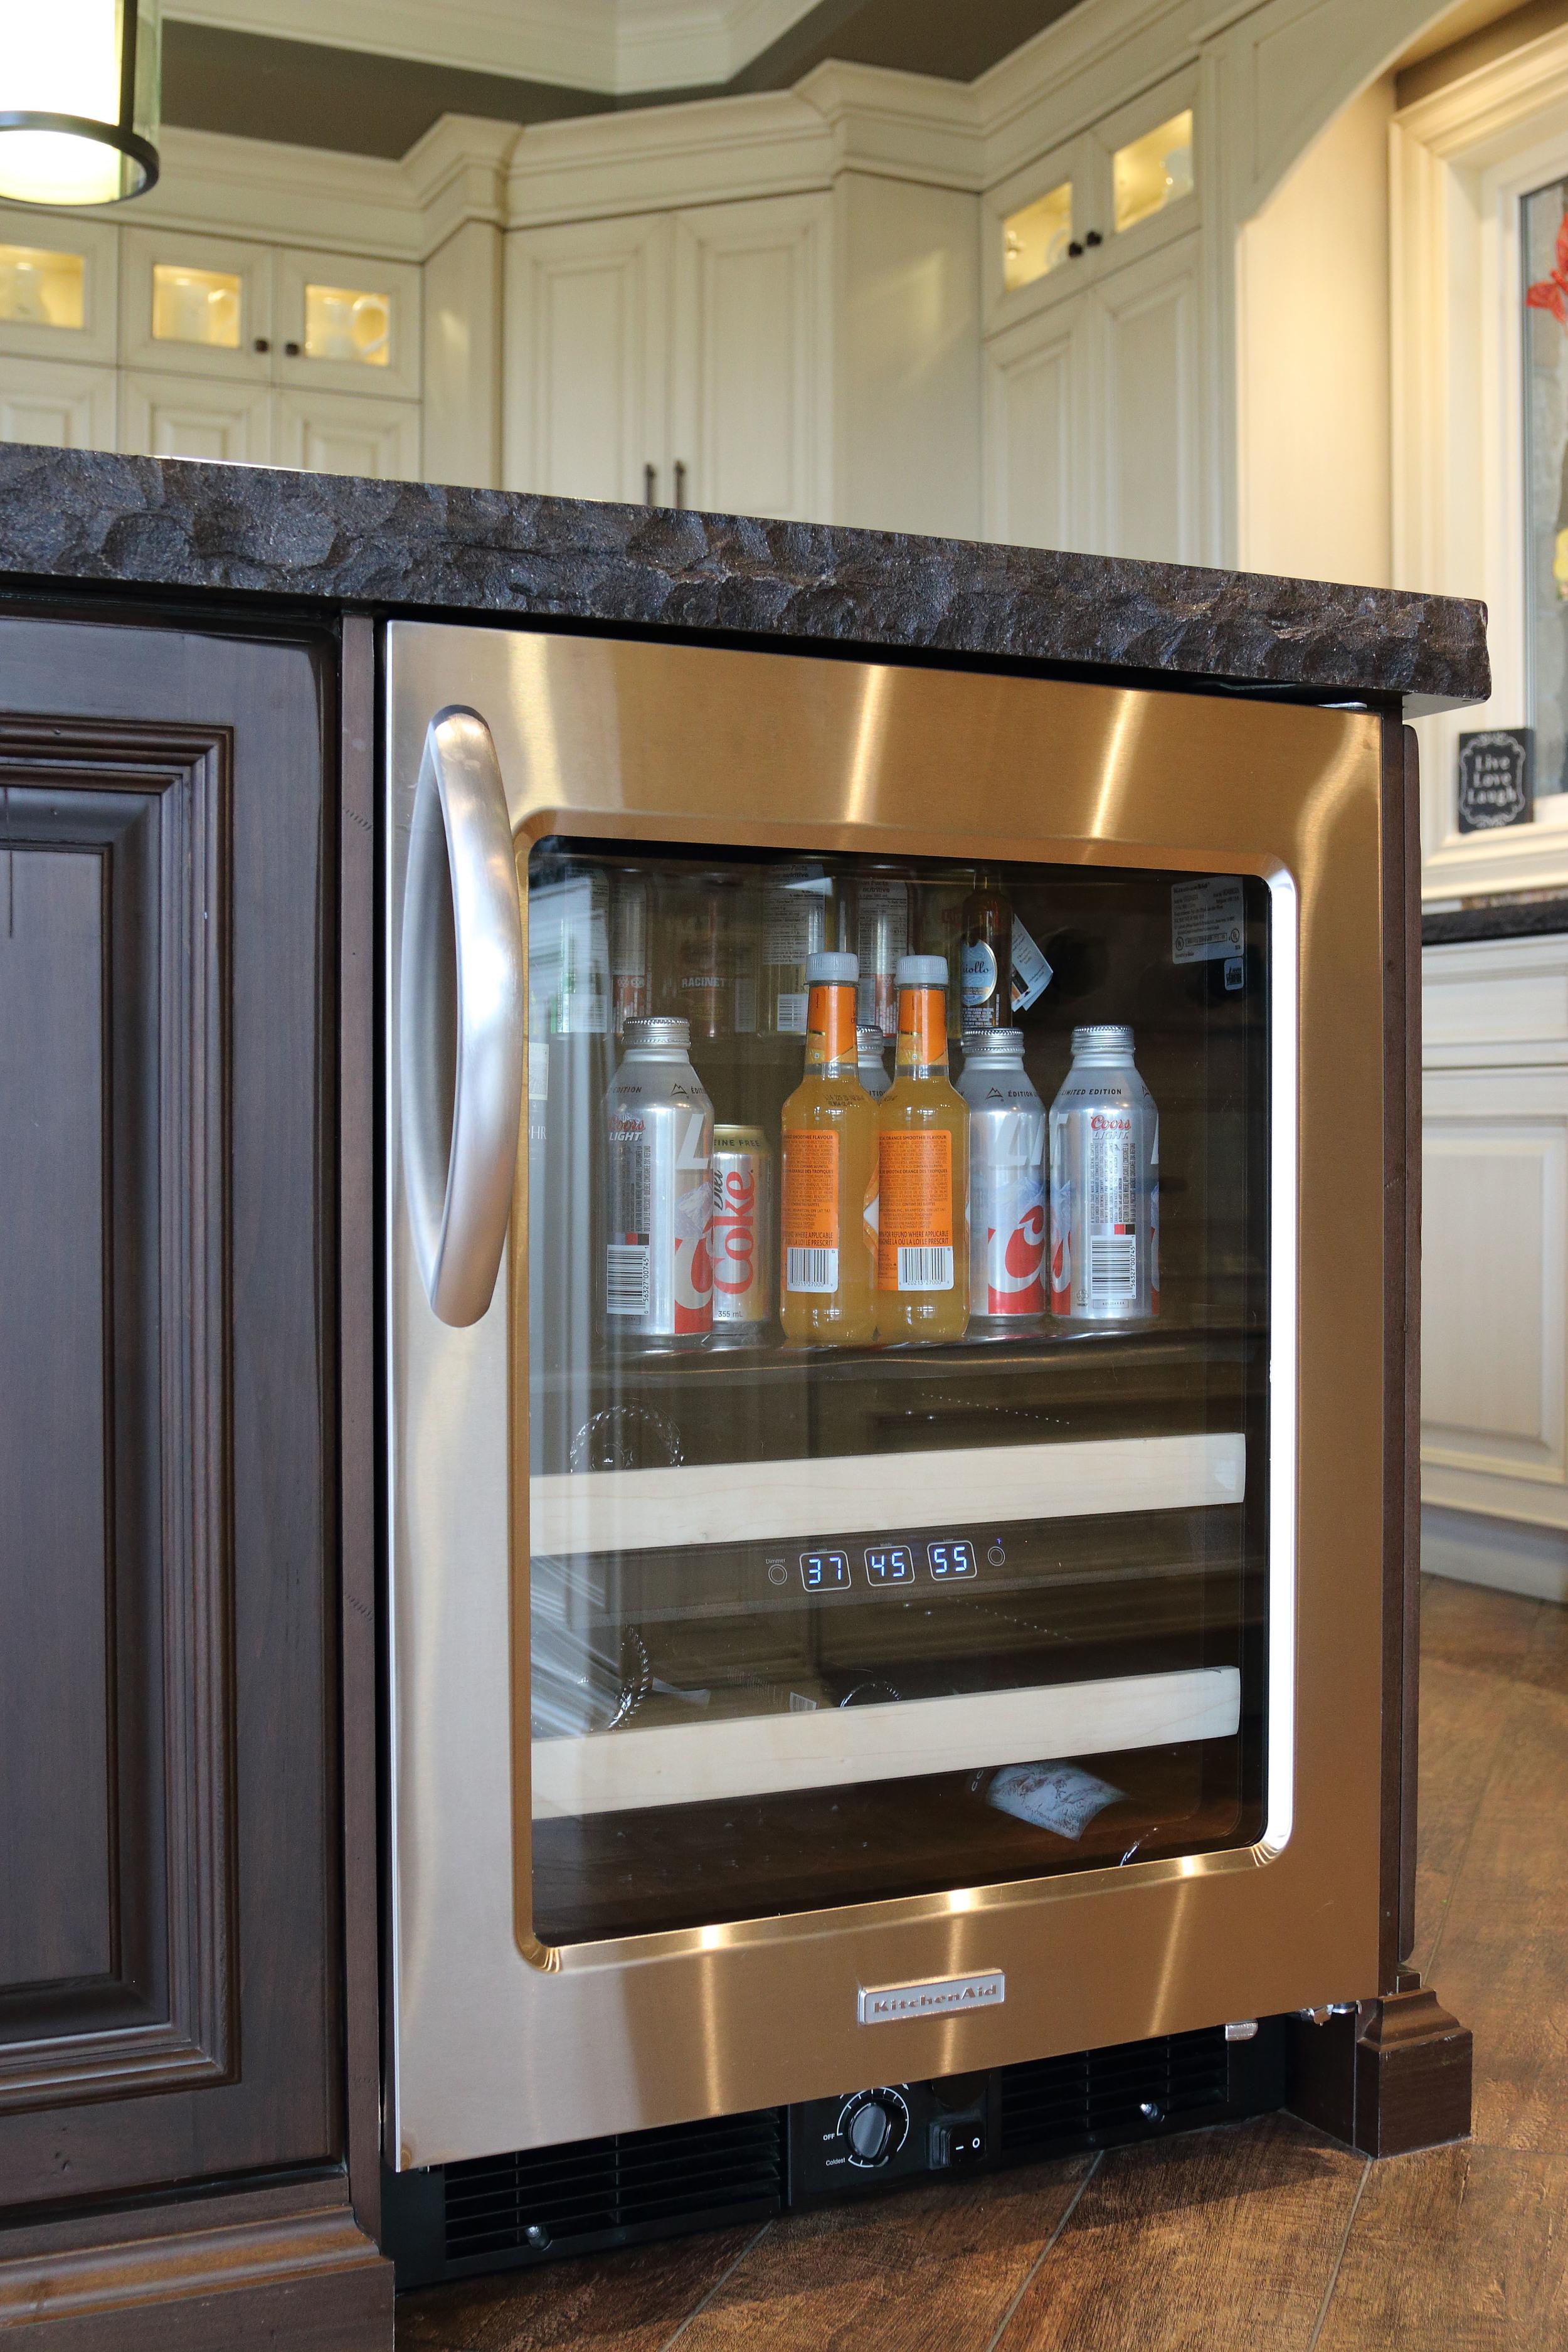 Boundary wine fridge.jpg